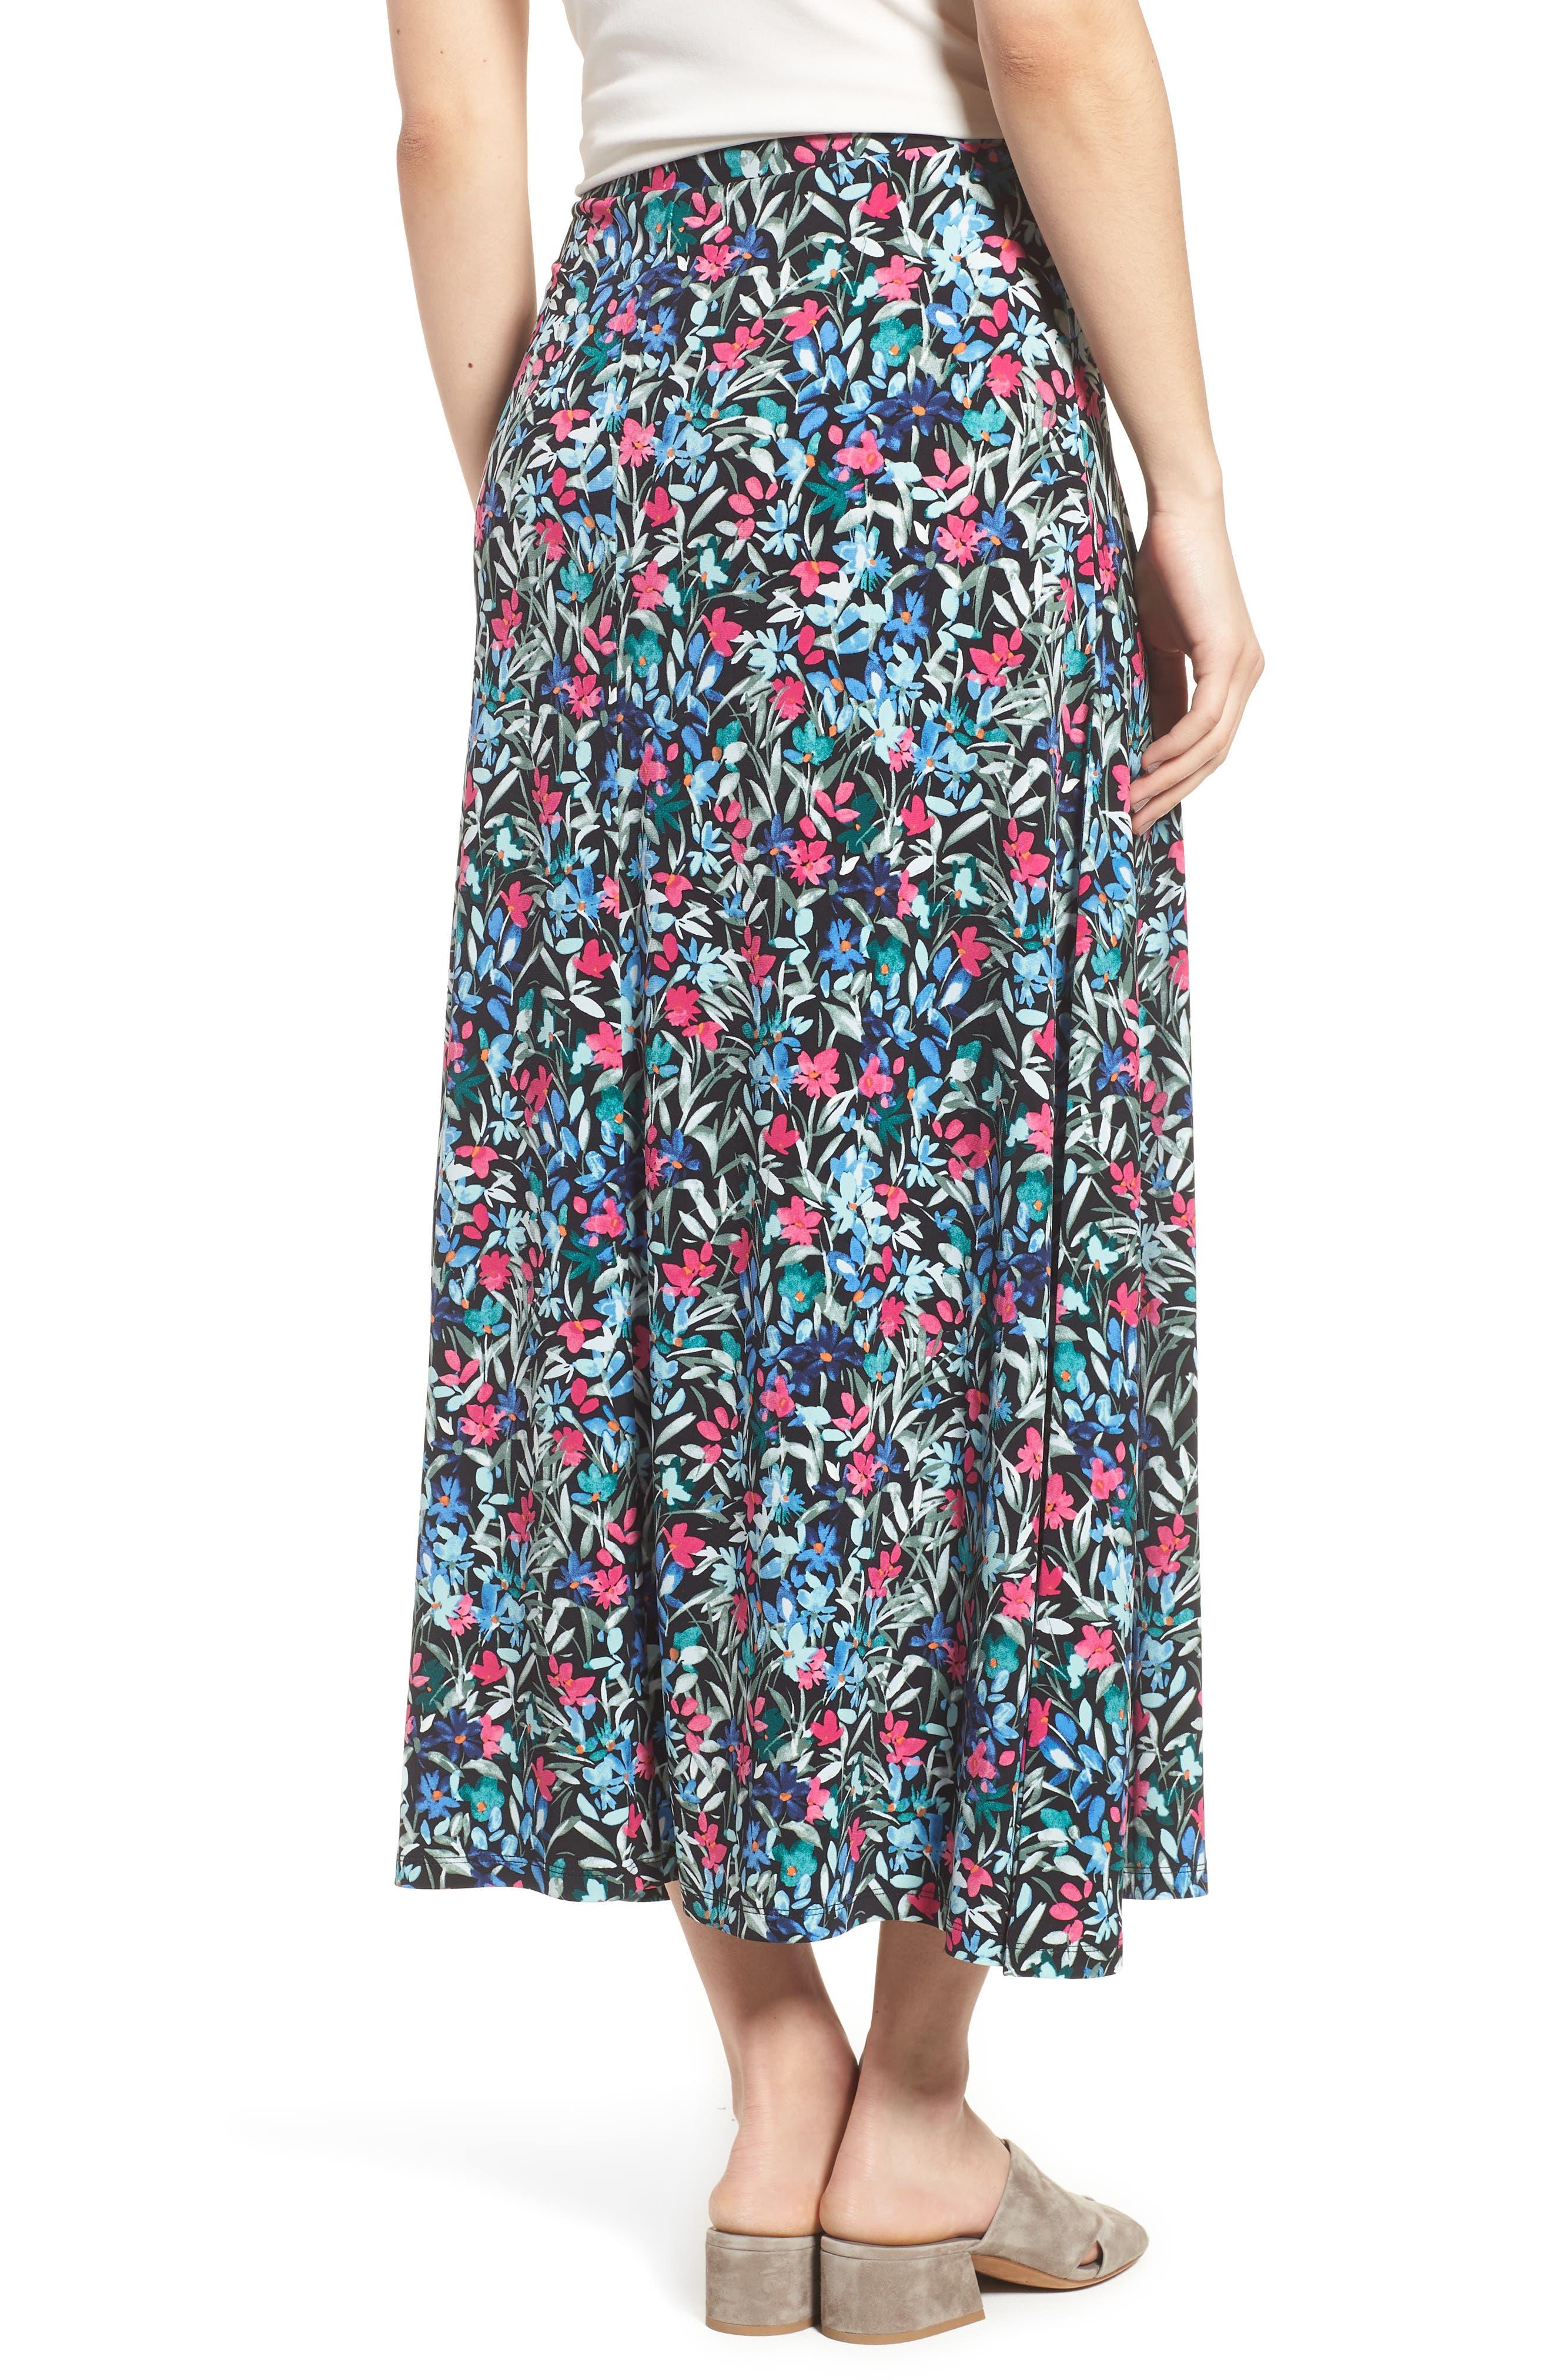 Radiant Flowers Maxi Skirt,                             Alternate thumbnail 2, color,                             060-Rich Black